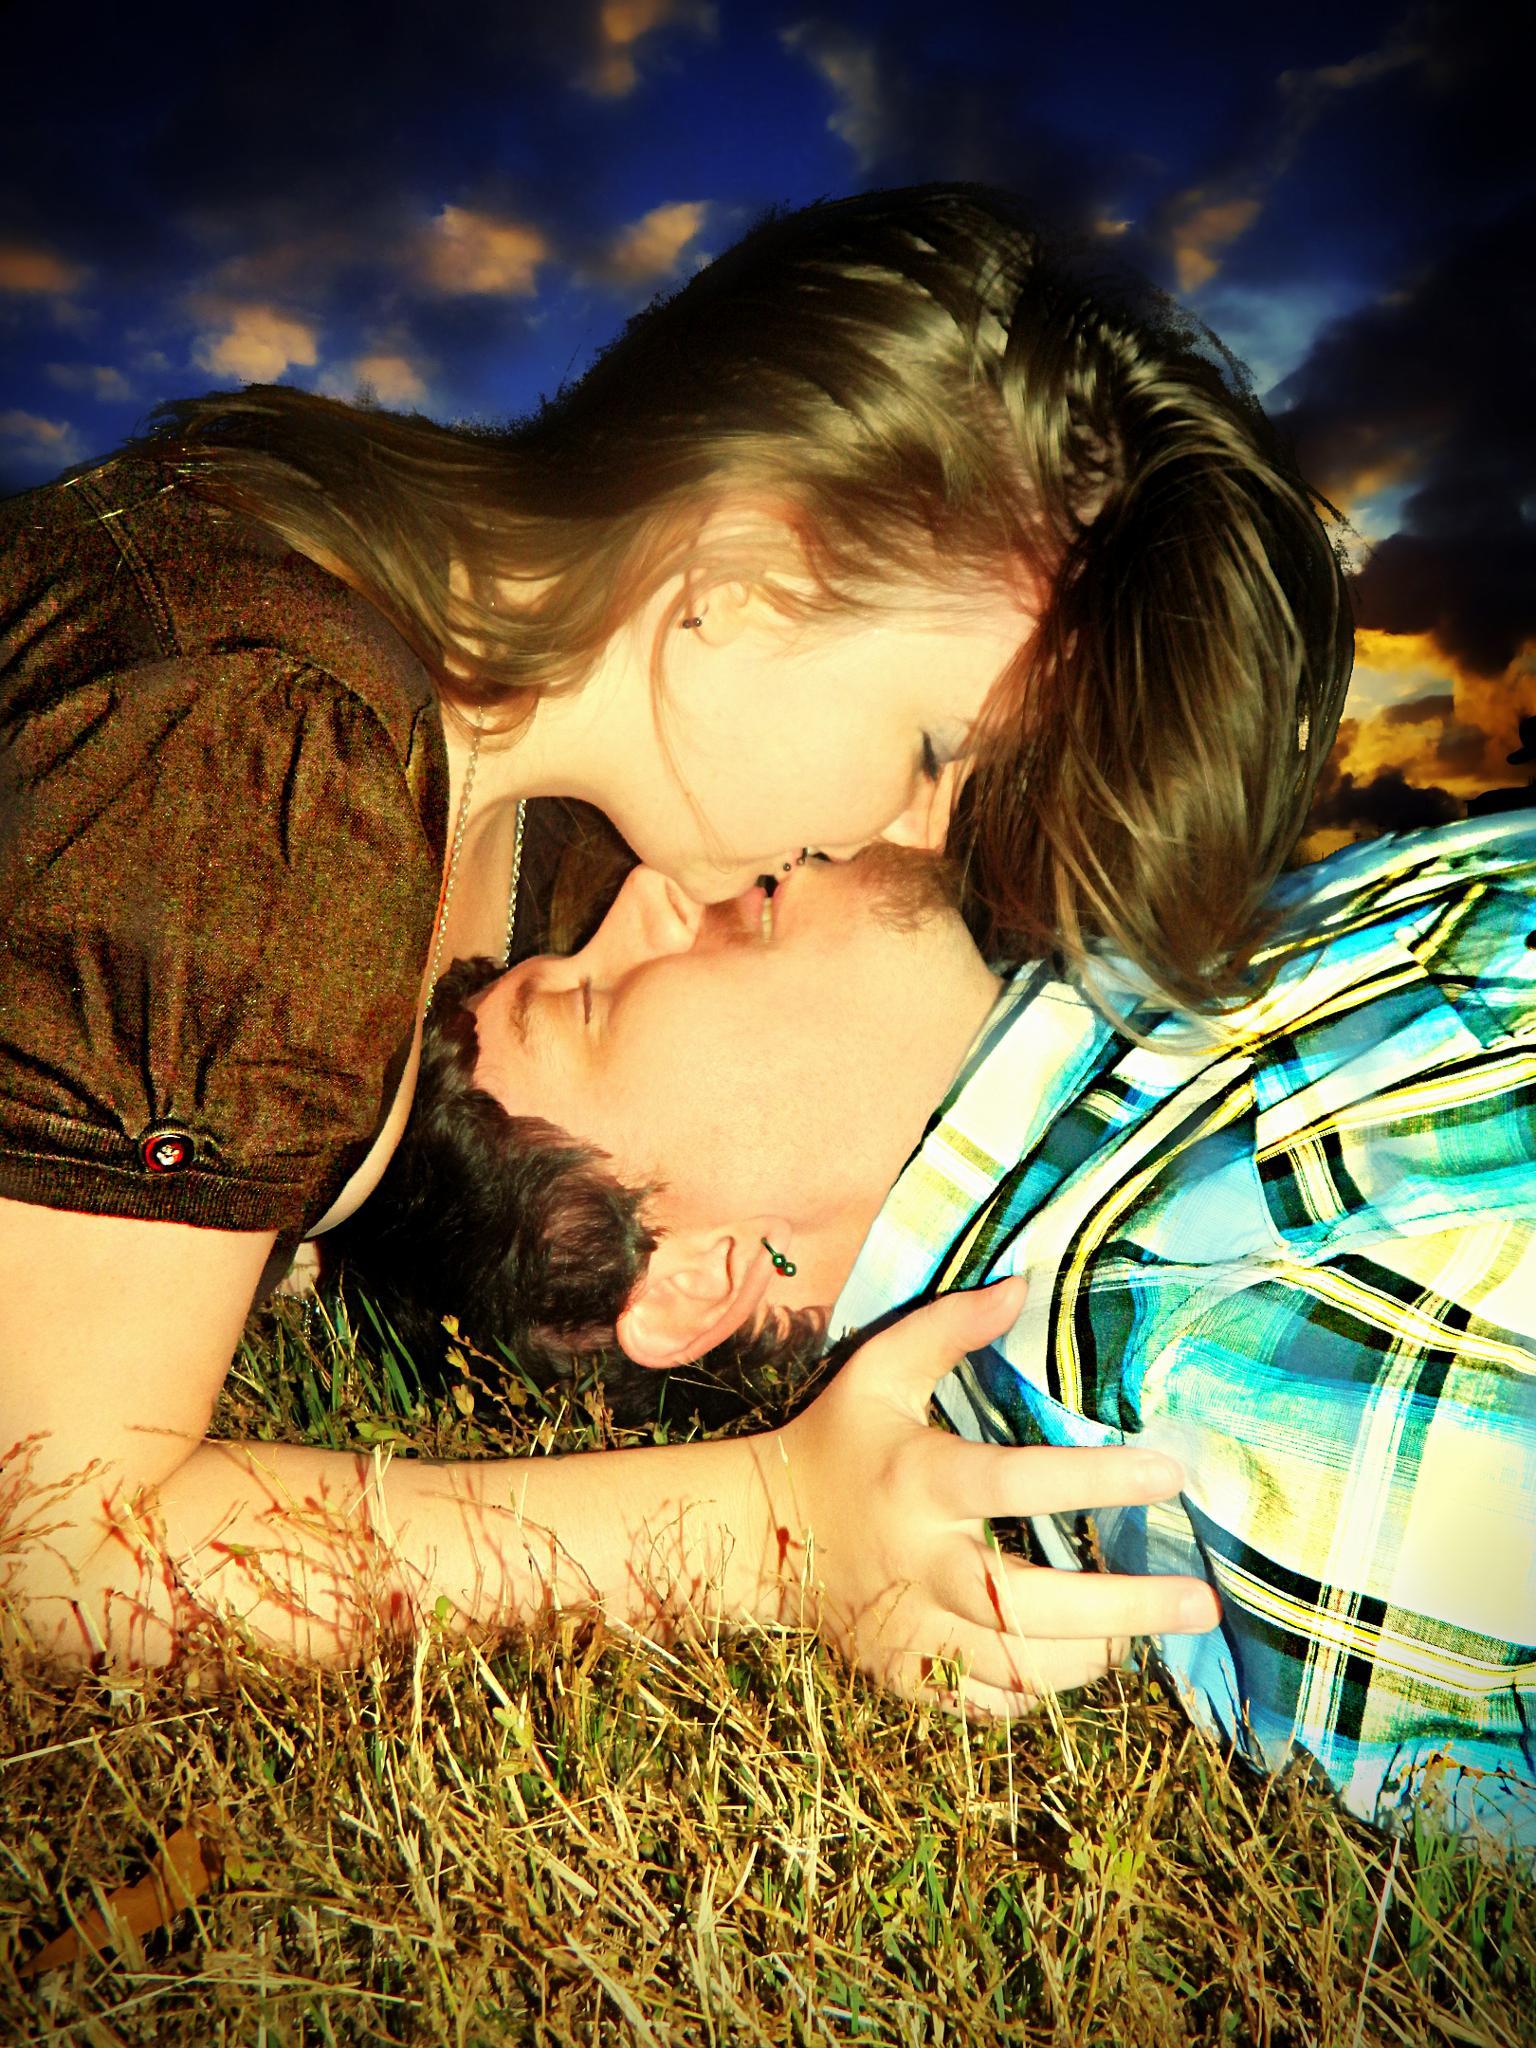 SUNSET KISS by Ashley Gray